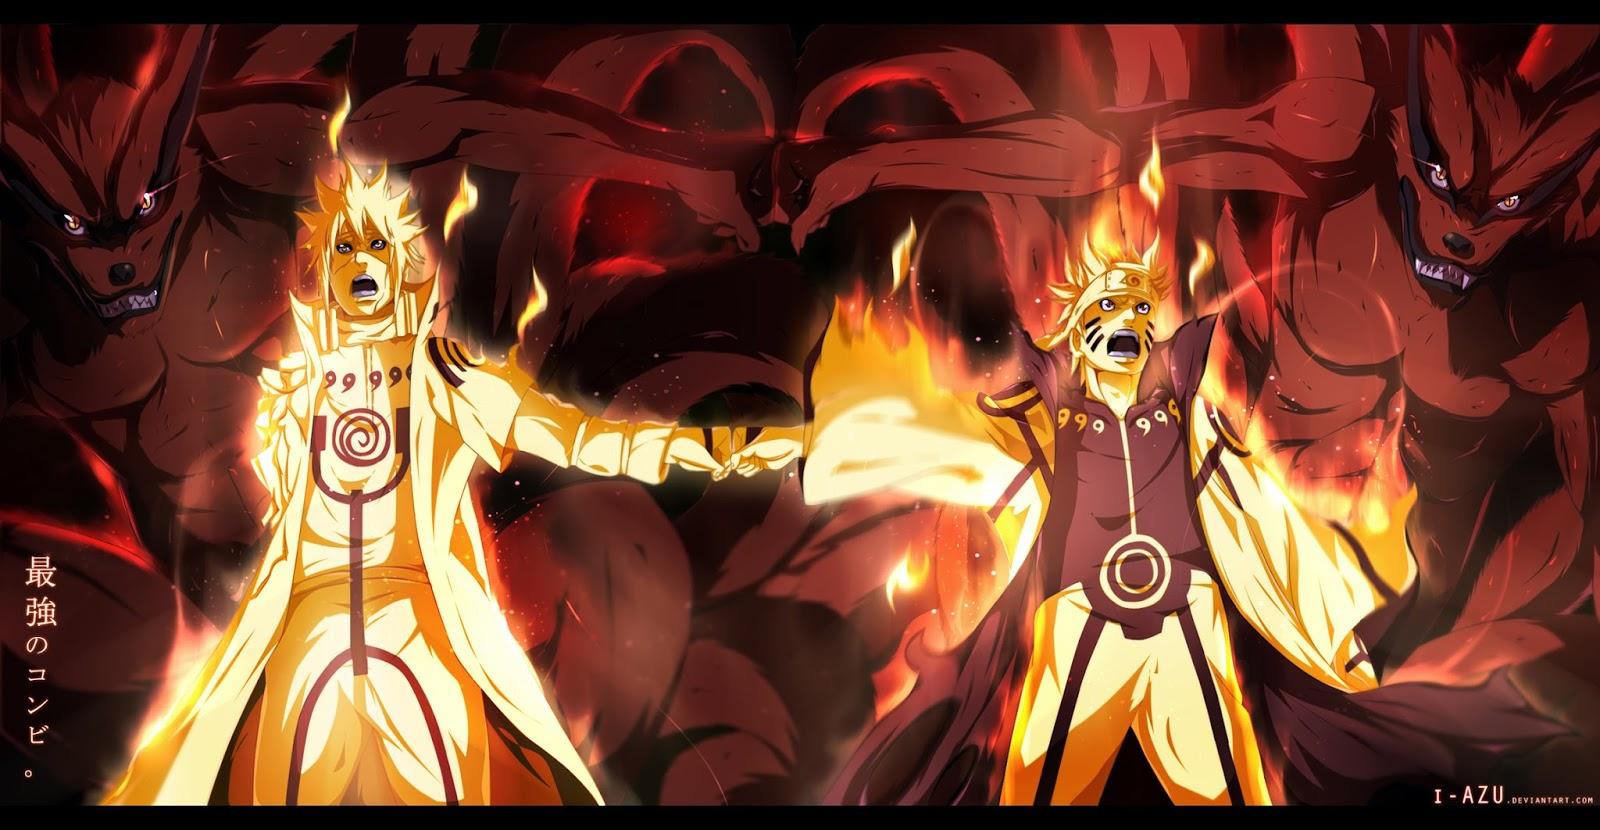 Minato Naruto Kyuubi Deviant Art Widescreen Anime HD Wallpaper 1600x830